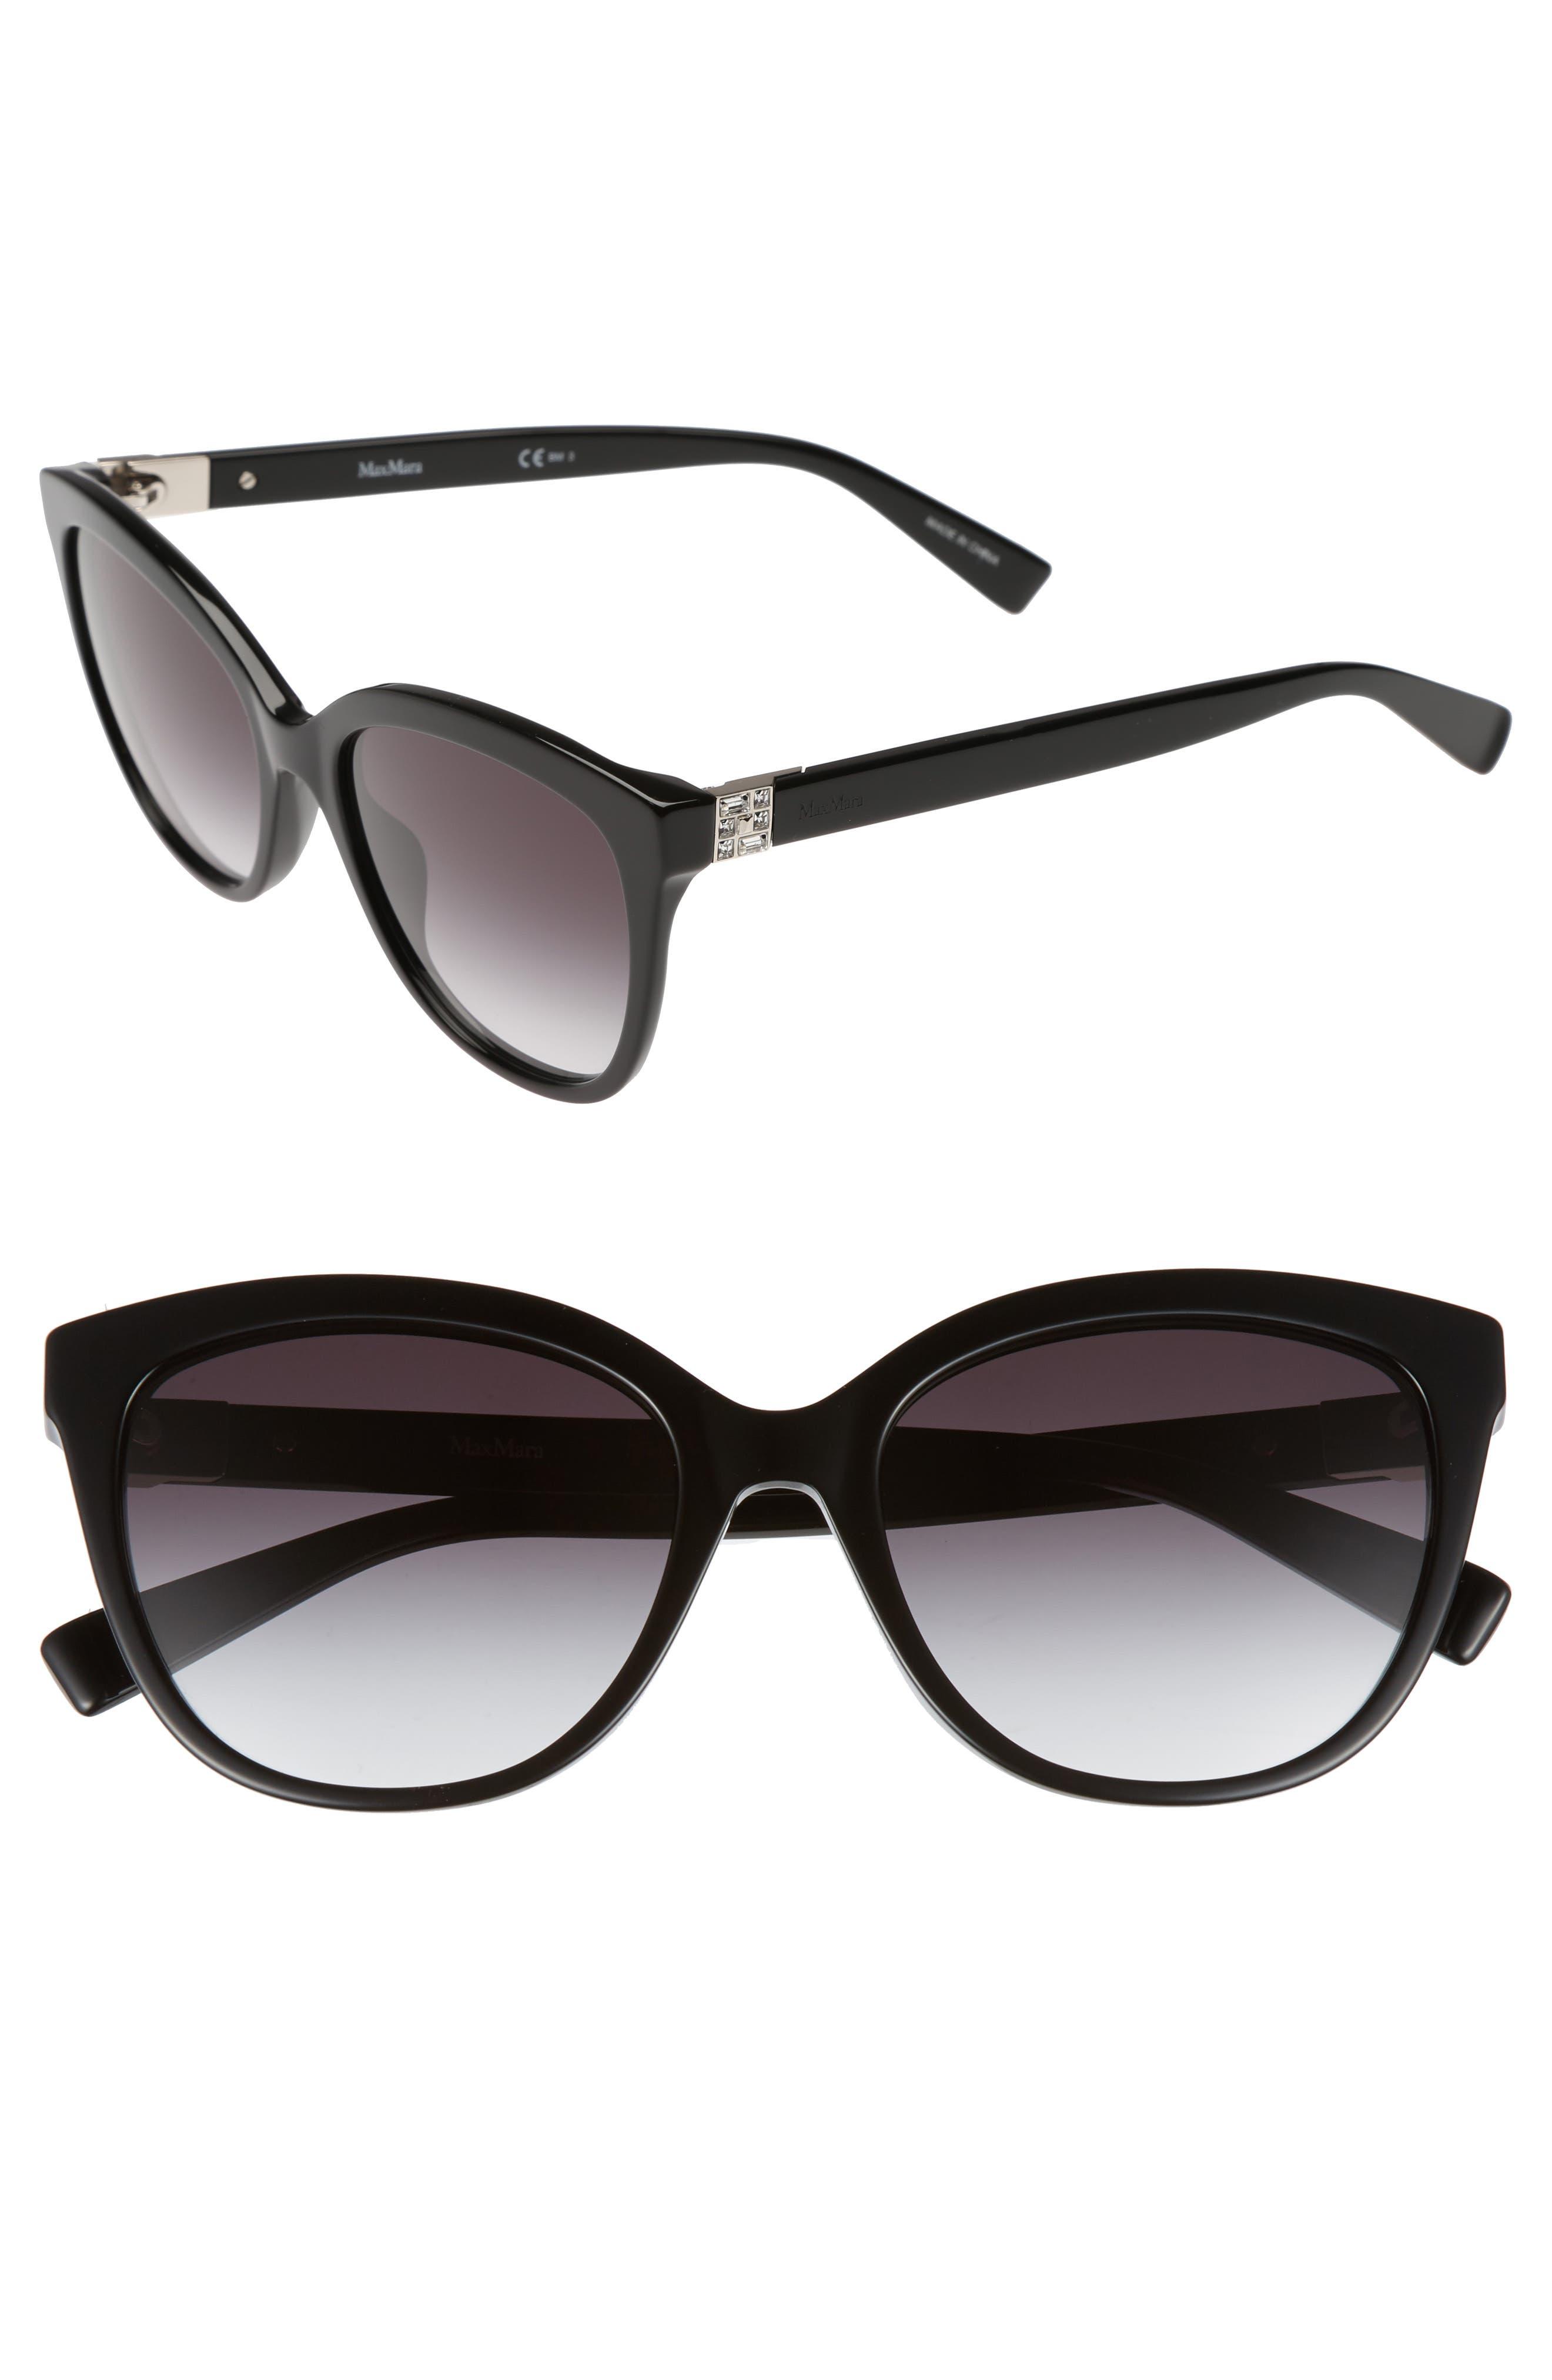 6cc7633bc0e6 Max Mara Tile 55Mm Cat Eye Sunglasses - Black